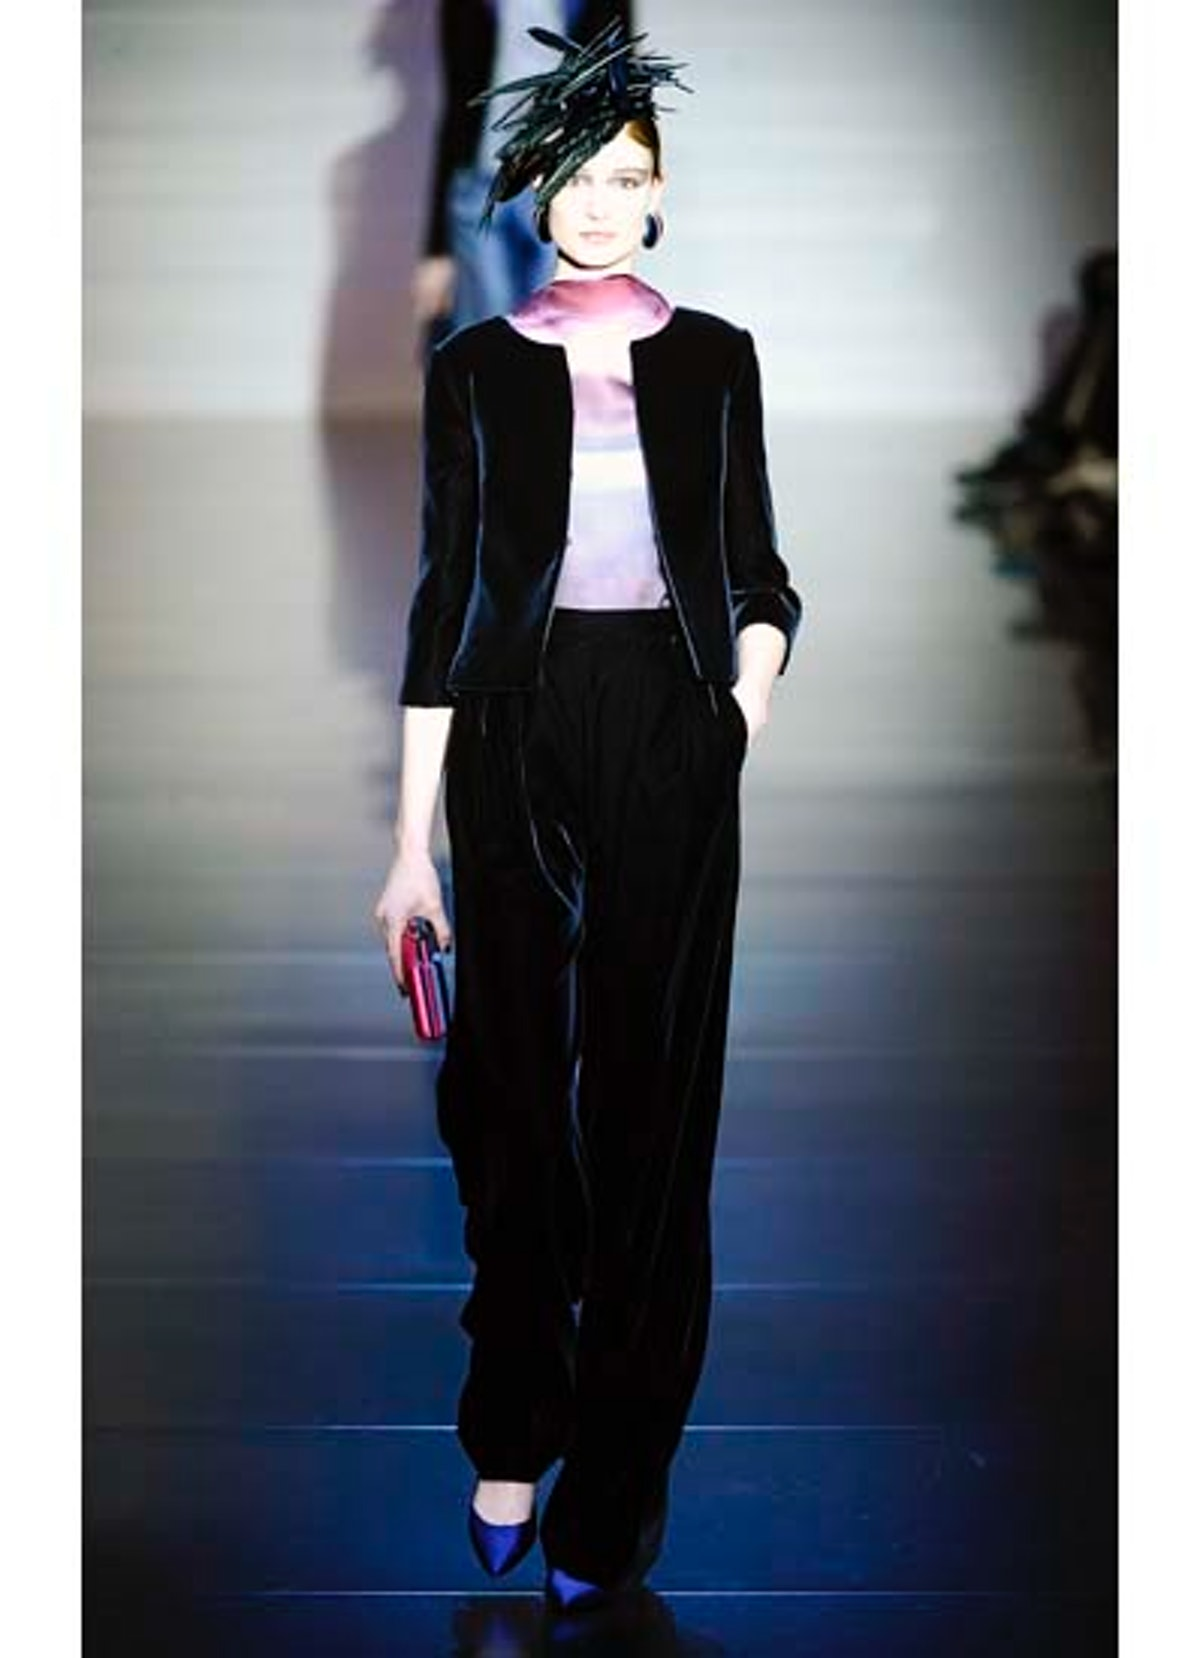 fass-giorgio-armani-couture-2012-runway-30-v.jpg